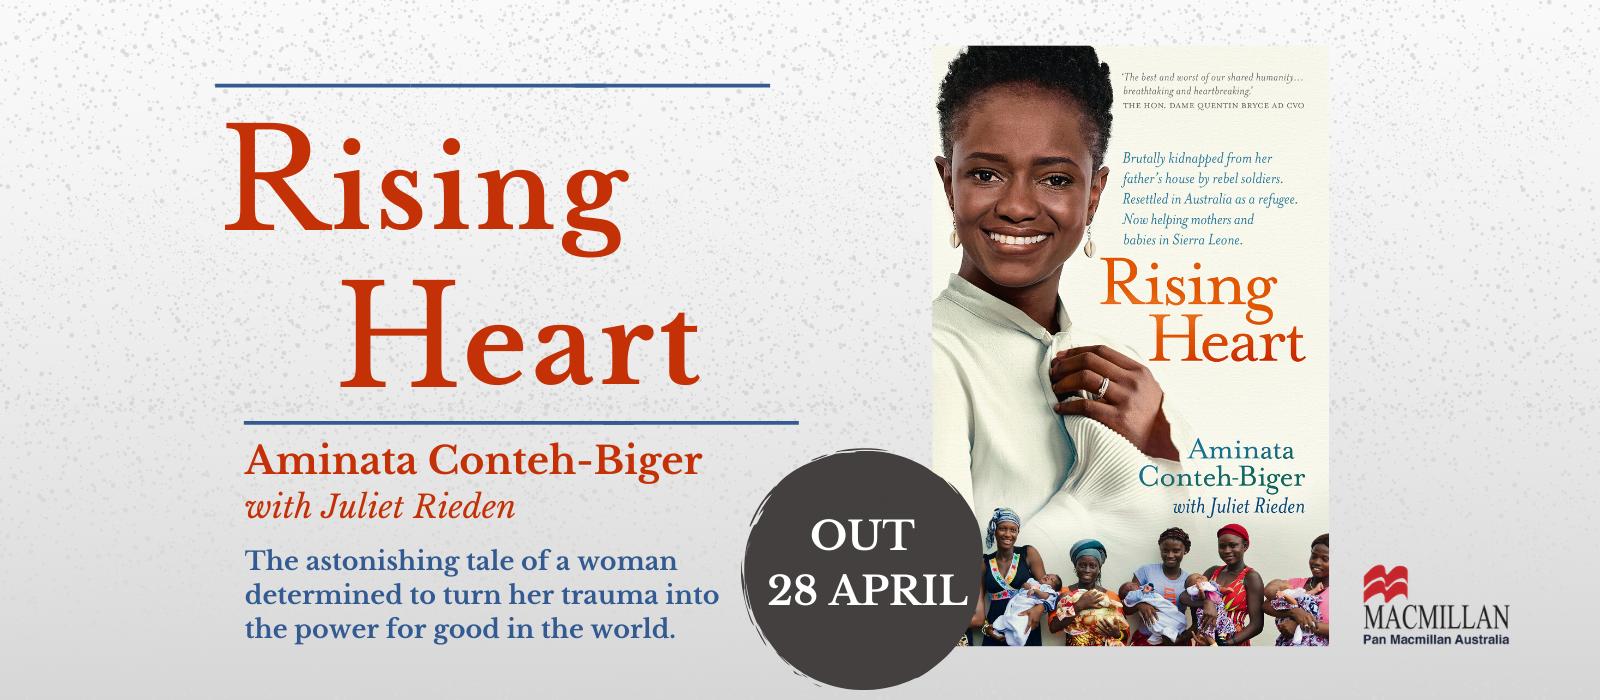 rising heart, book, book cover, australian author, refugee, Aminata Conteh-Biger, Juliet Rieden, Sierra Leone